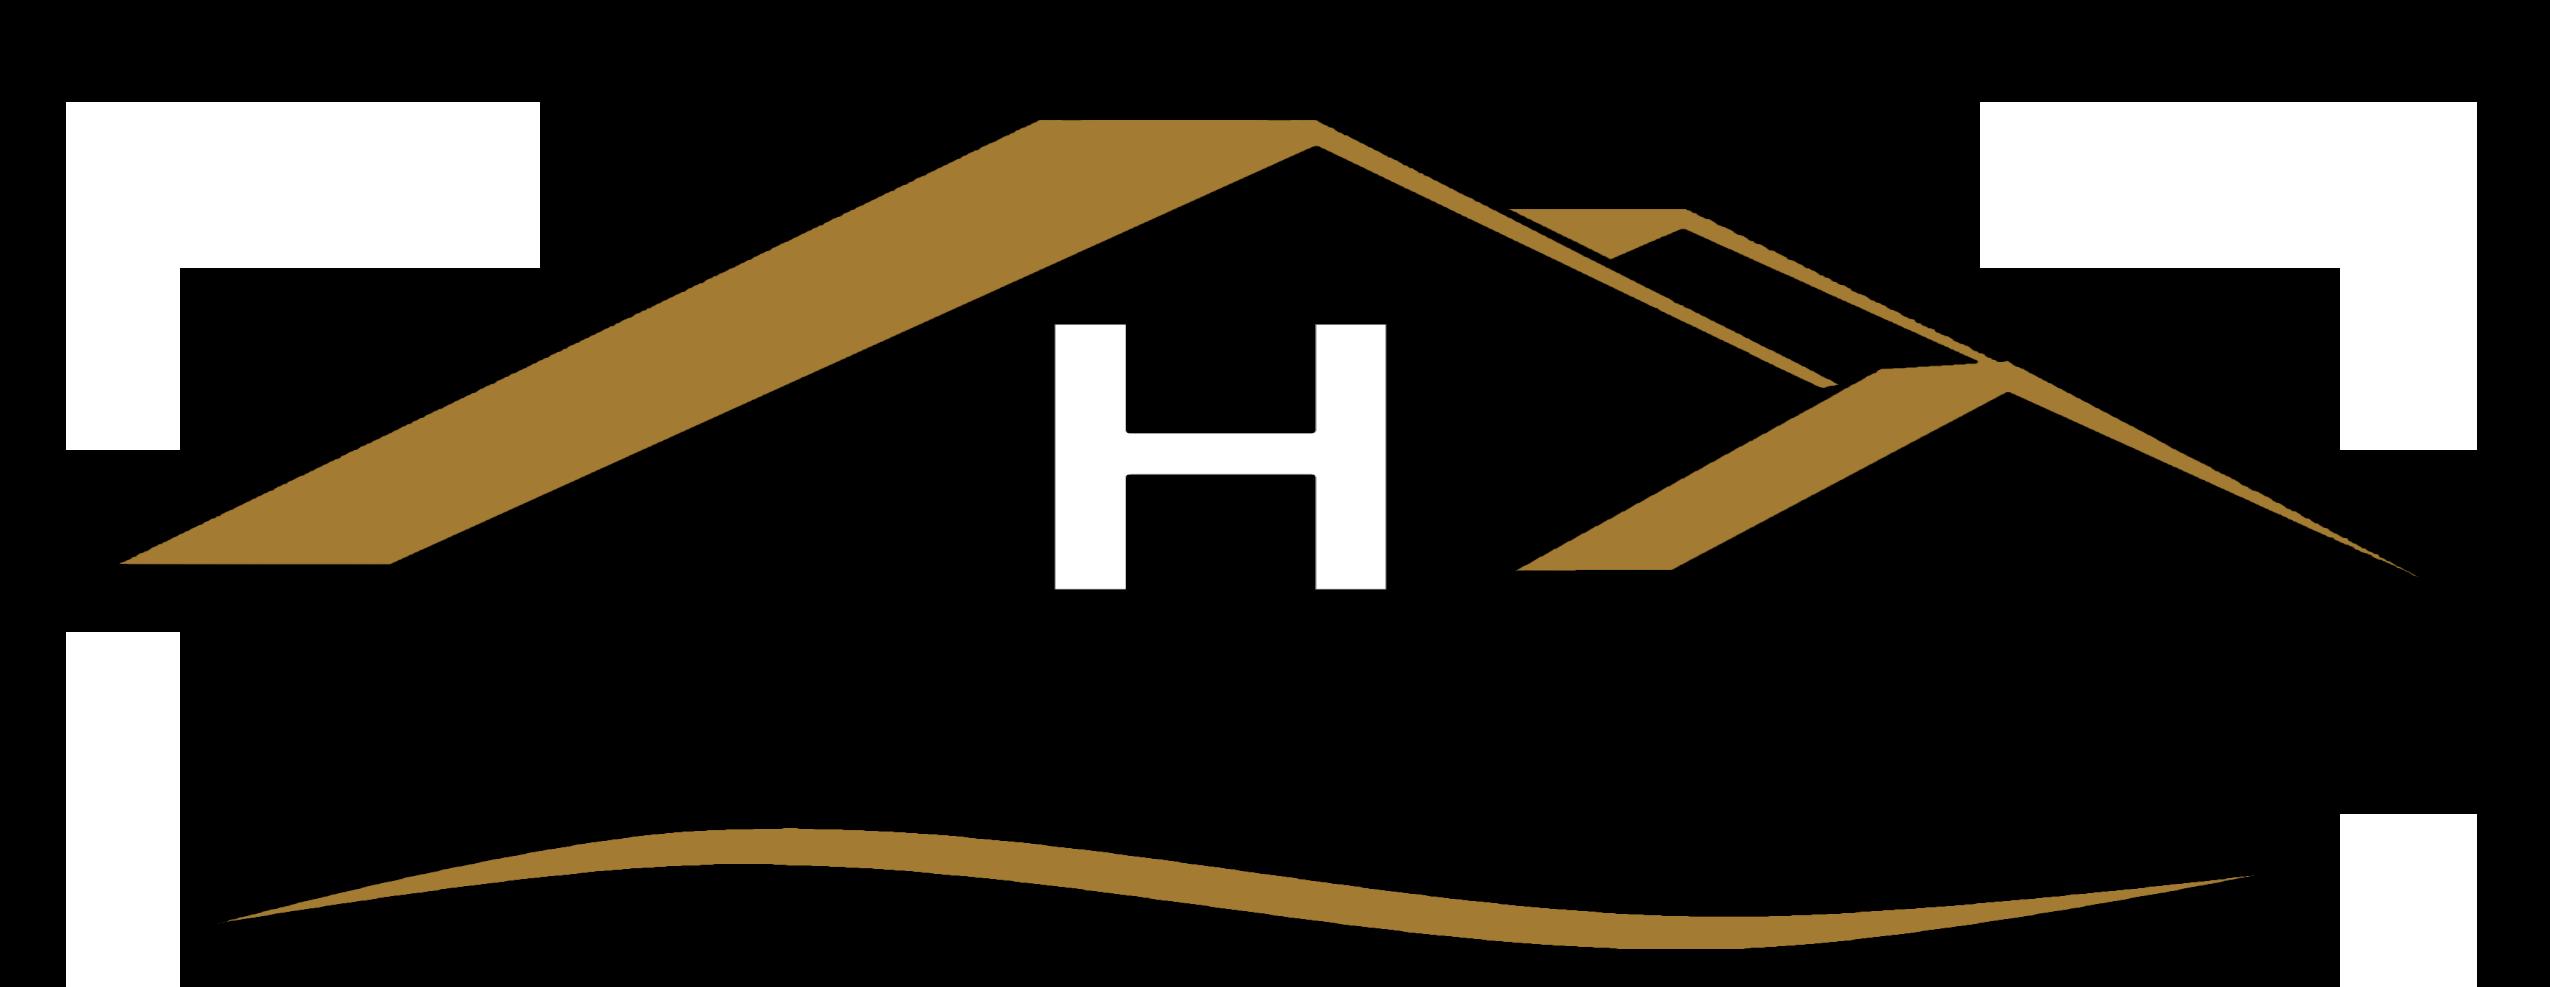 The Carl Hawthorne Team logo